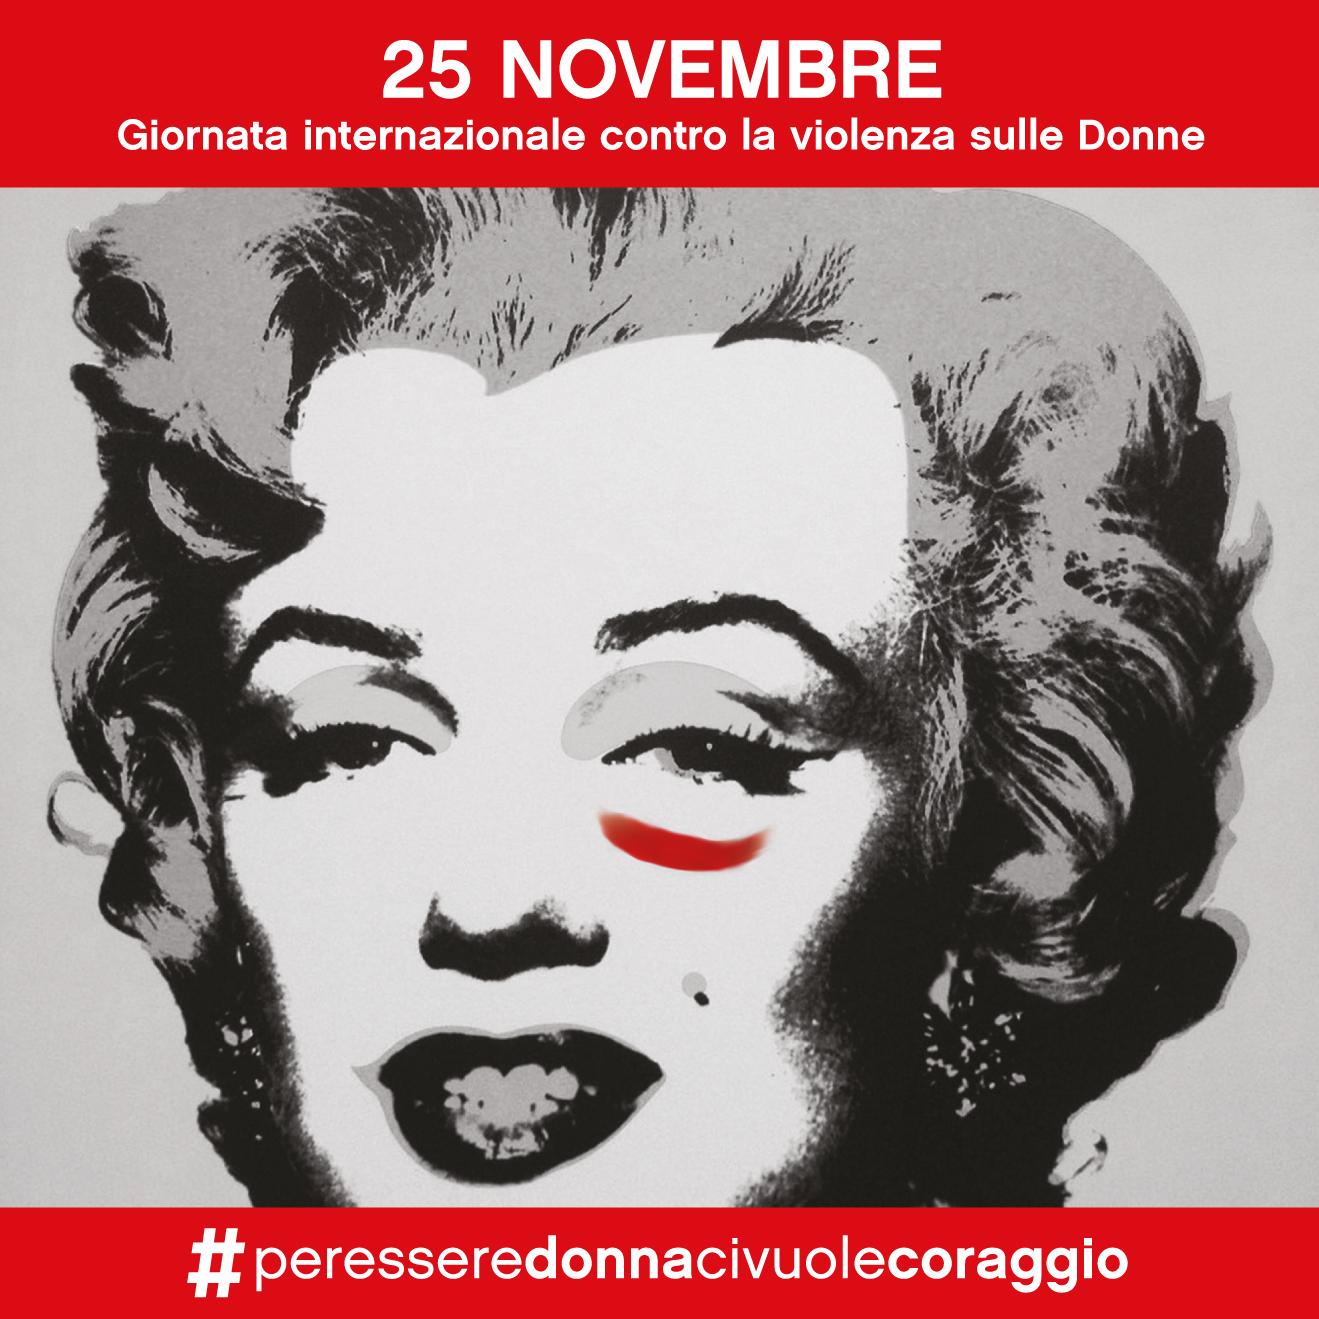 25 Novembre - Un selfie contro la violenza sulle donne